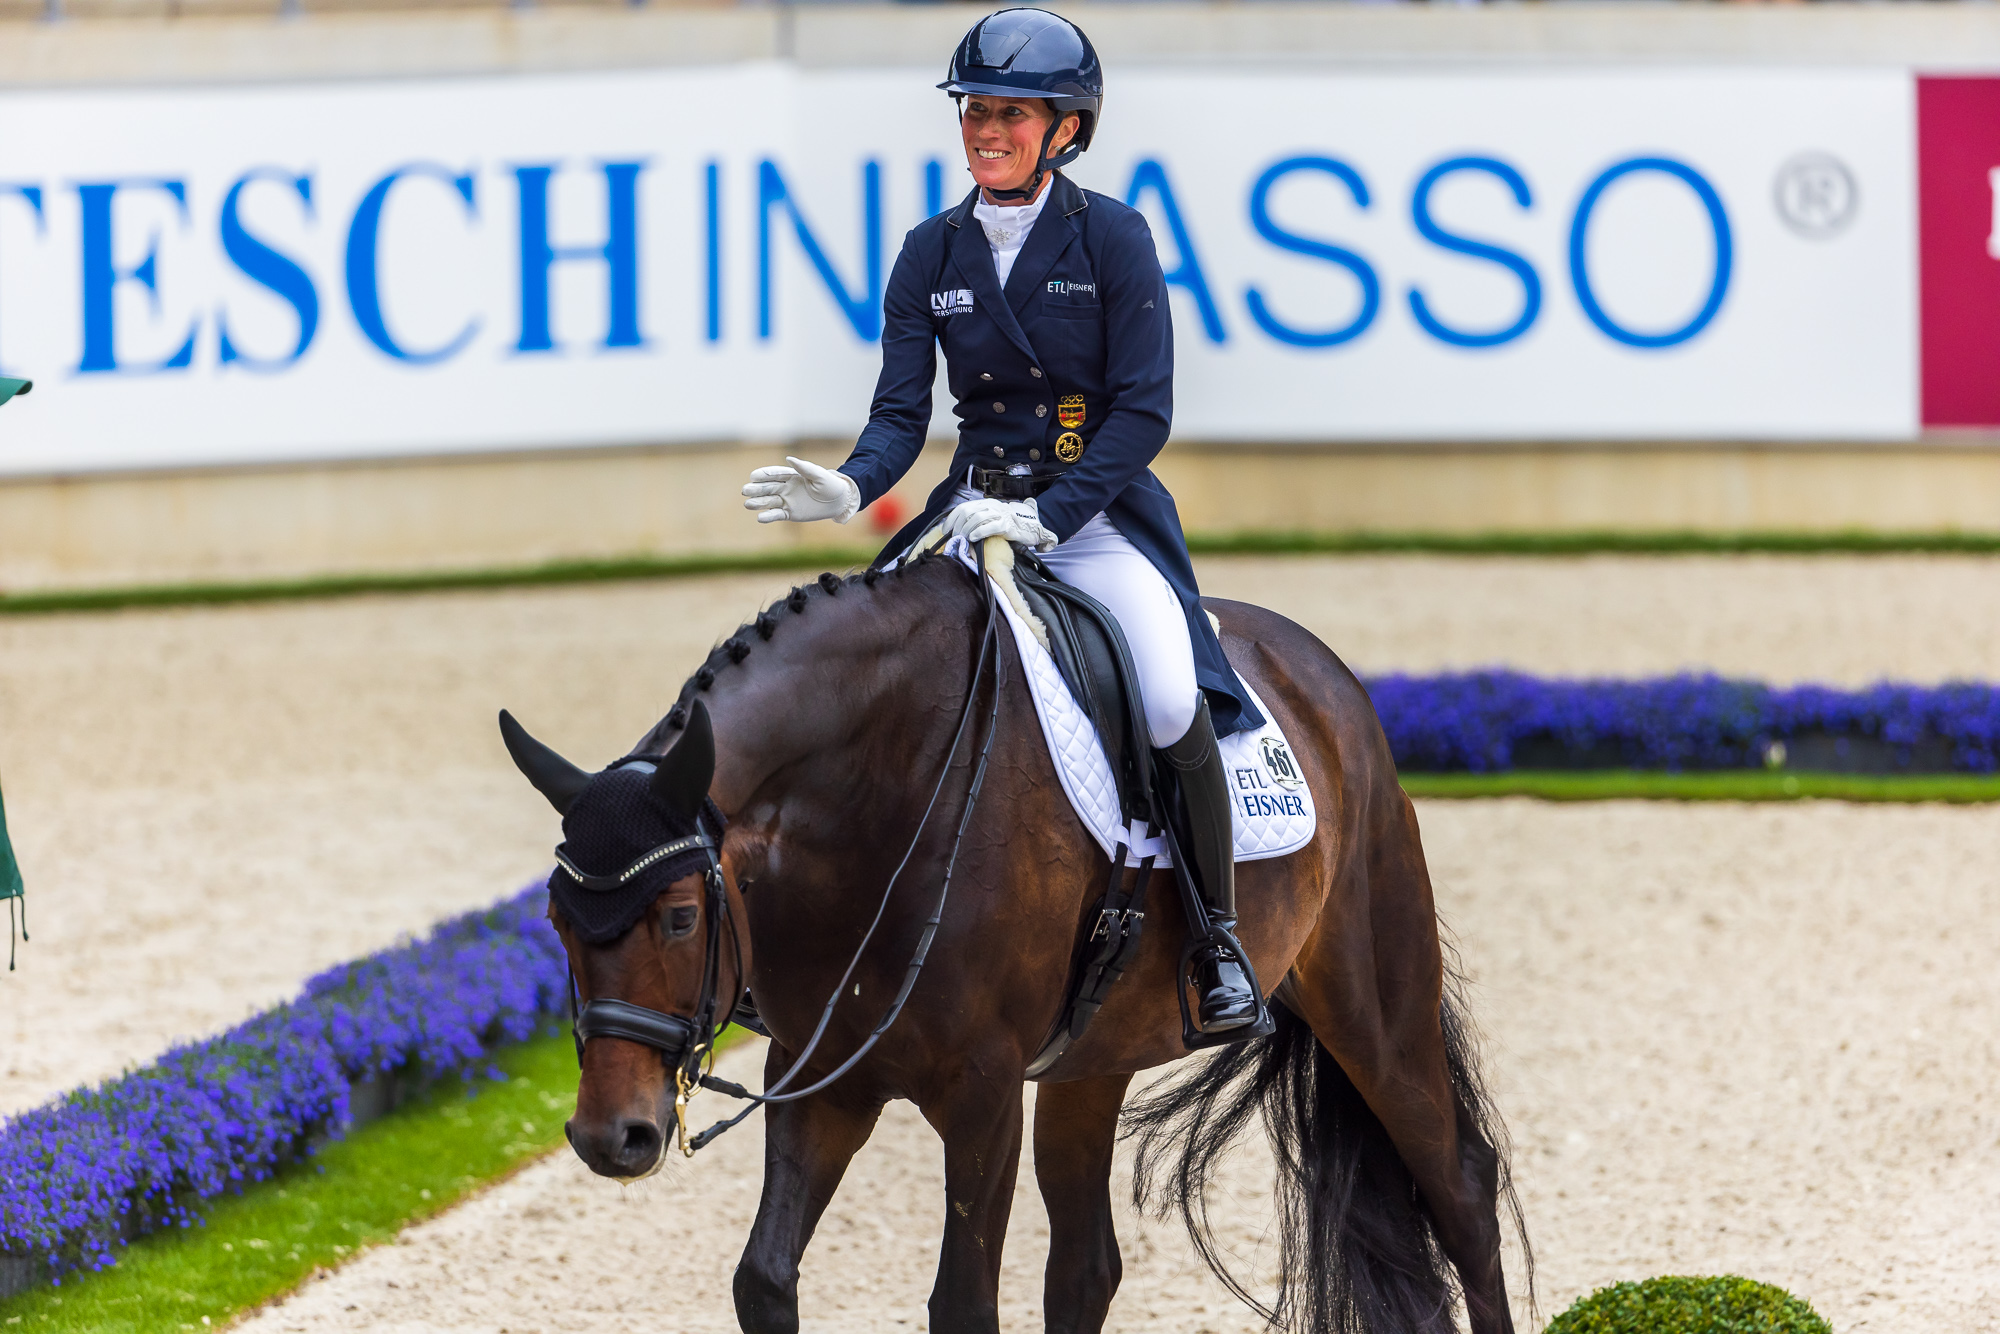 CDI Aachen: Helen Langehanenberg wins Prix St. Georges